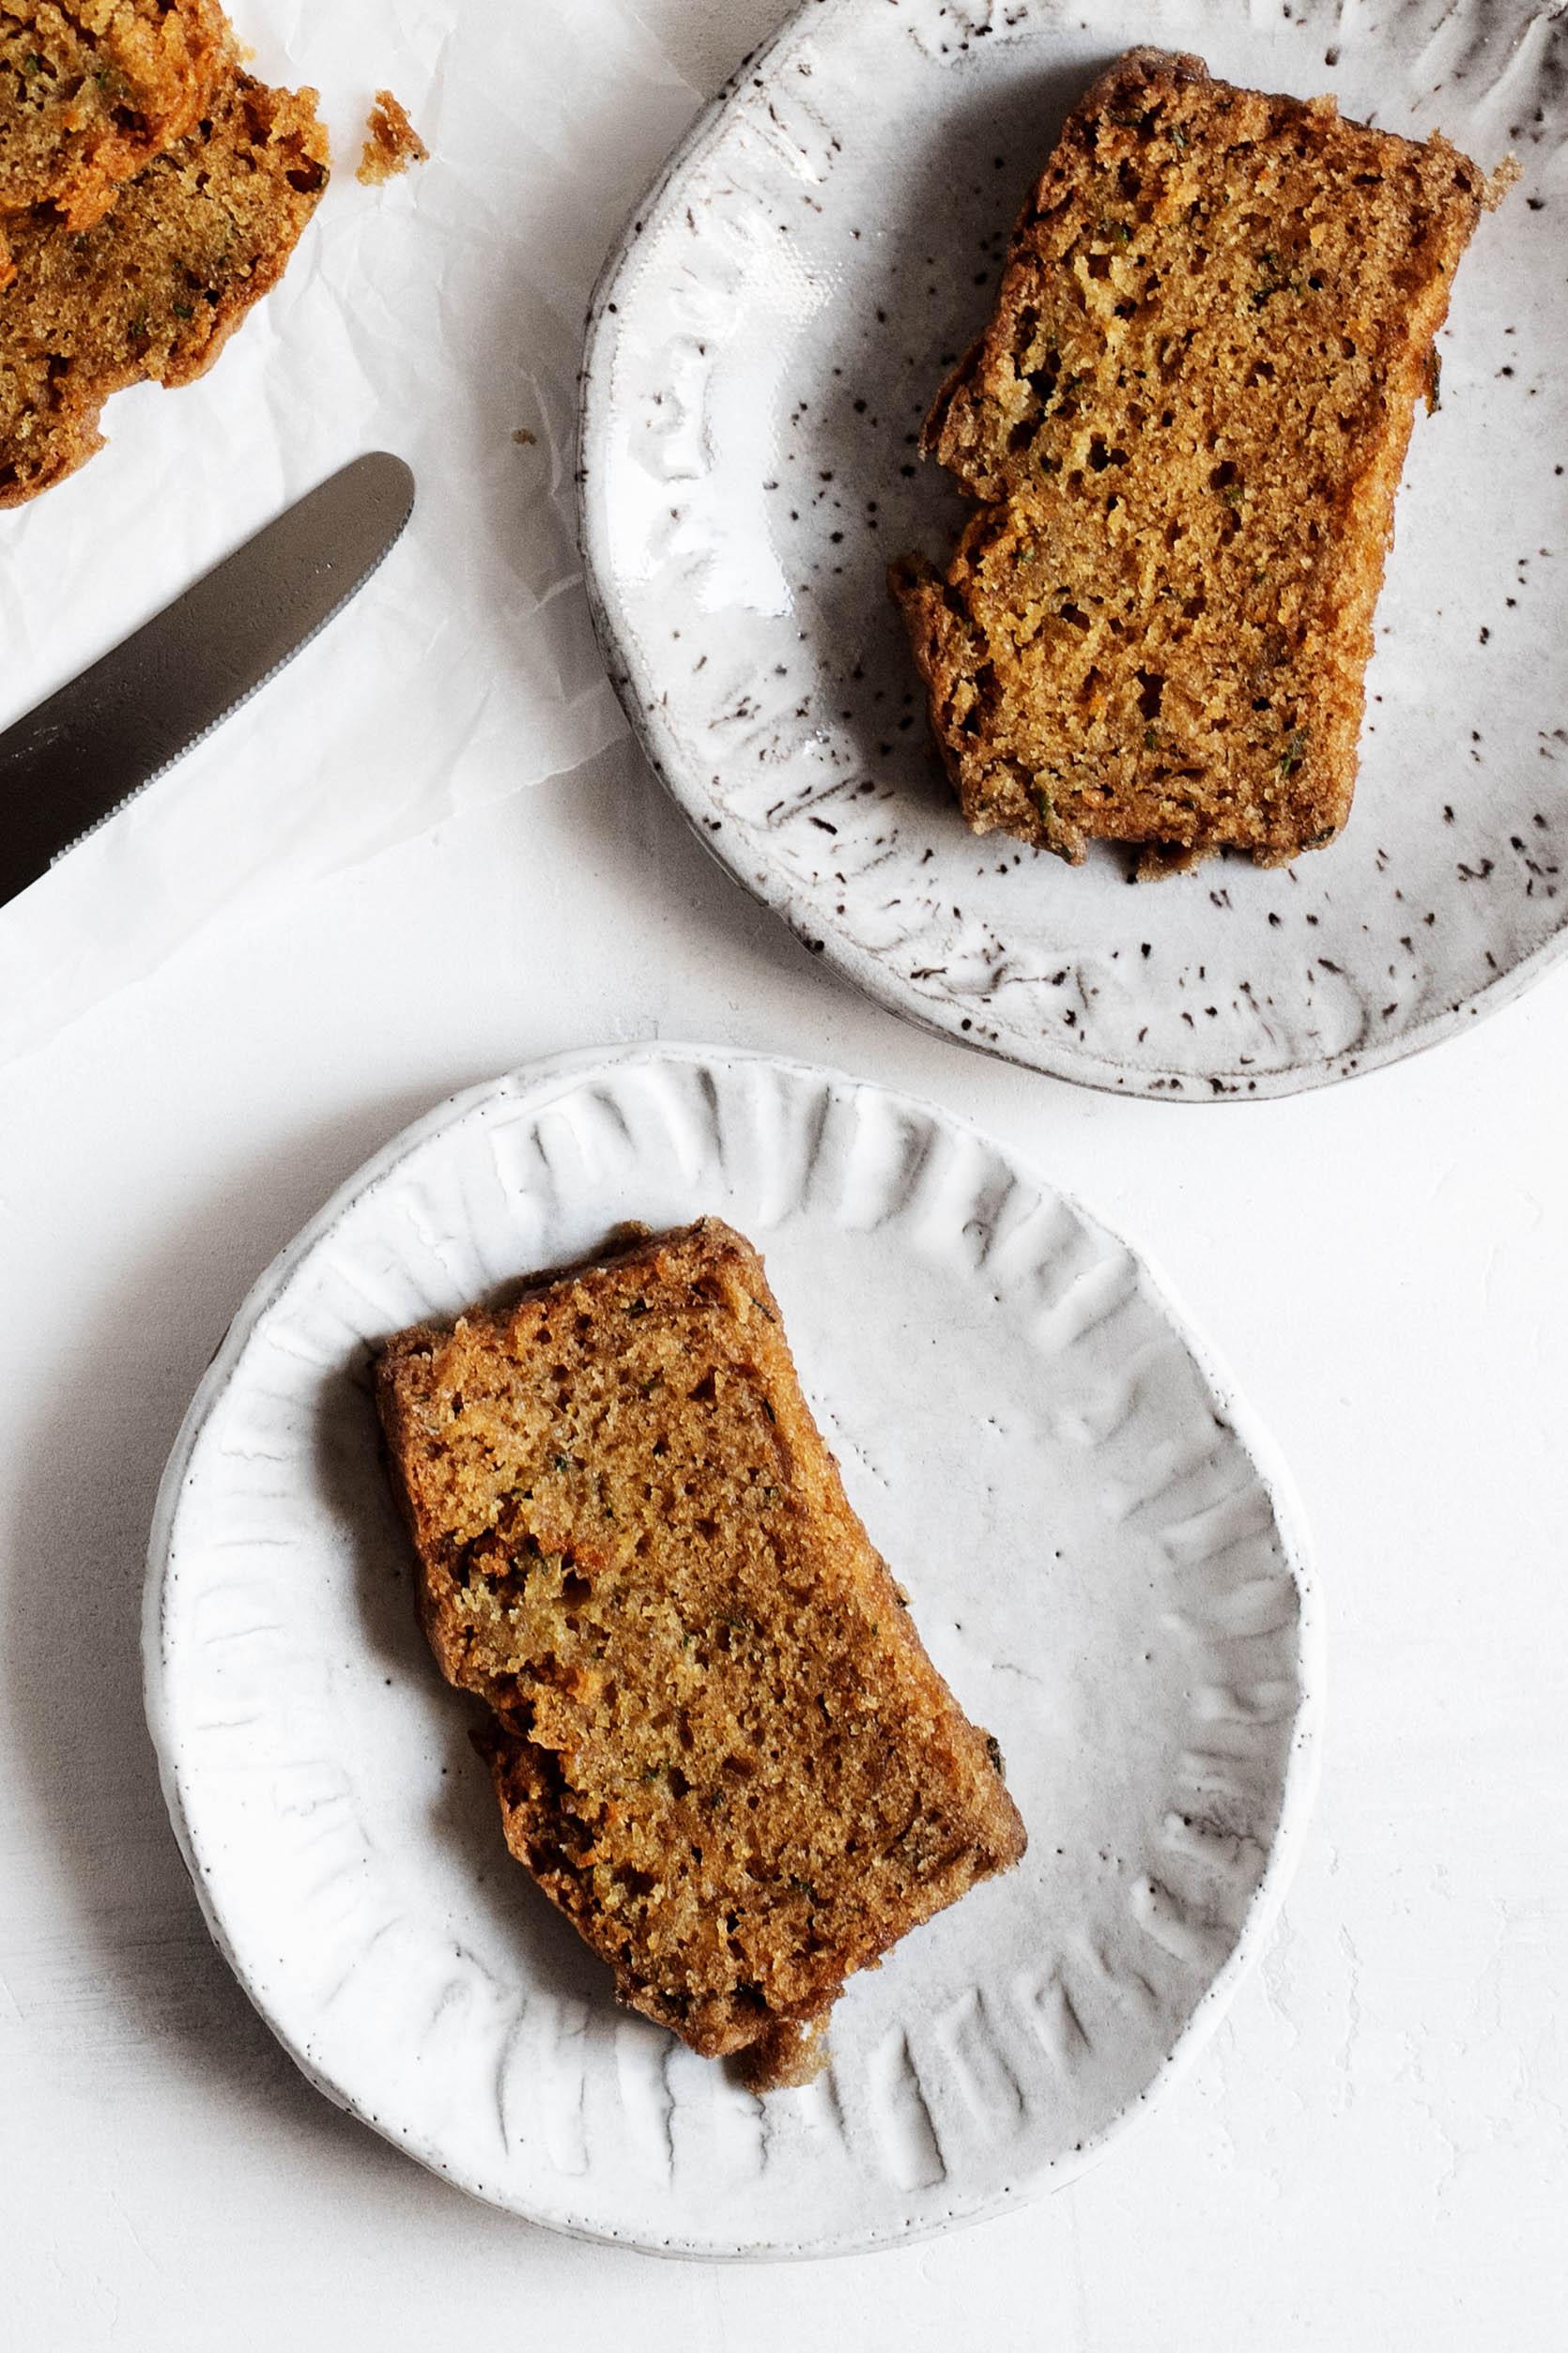 Classic Vegan Zucchini Bread | The Full Helping